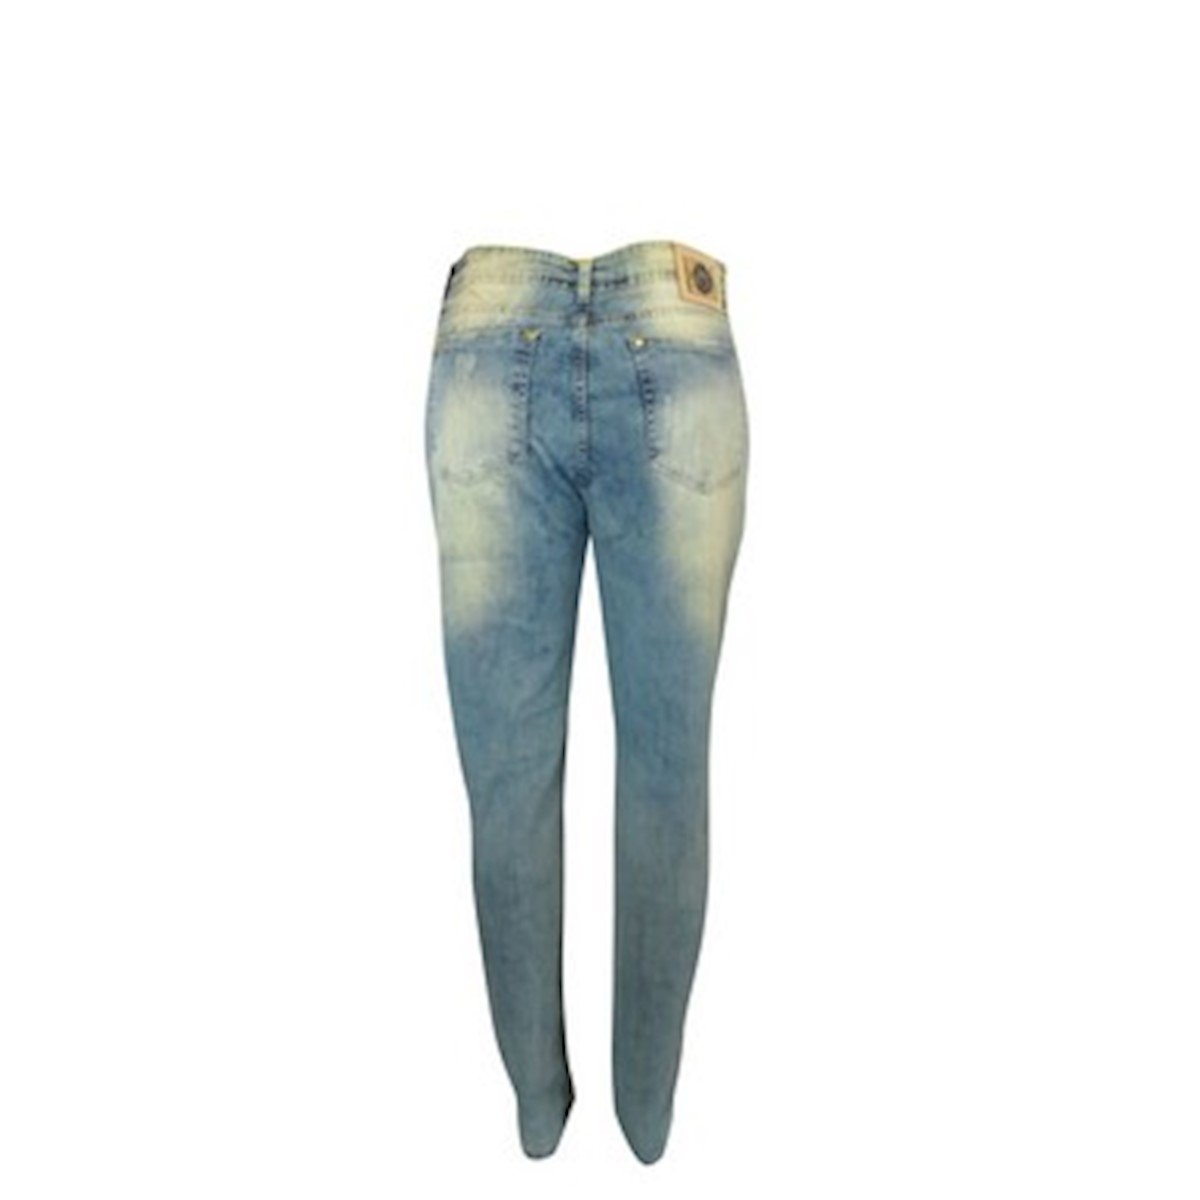 Visual Visual Jeans Calça Feminina Jeans Calça Feminina Azul 67Iw8x